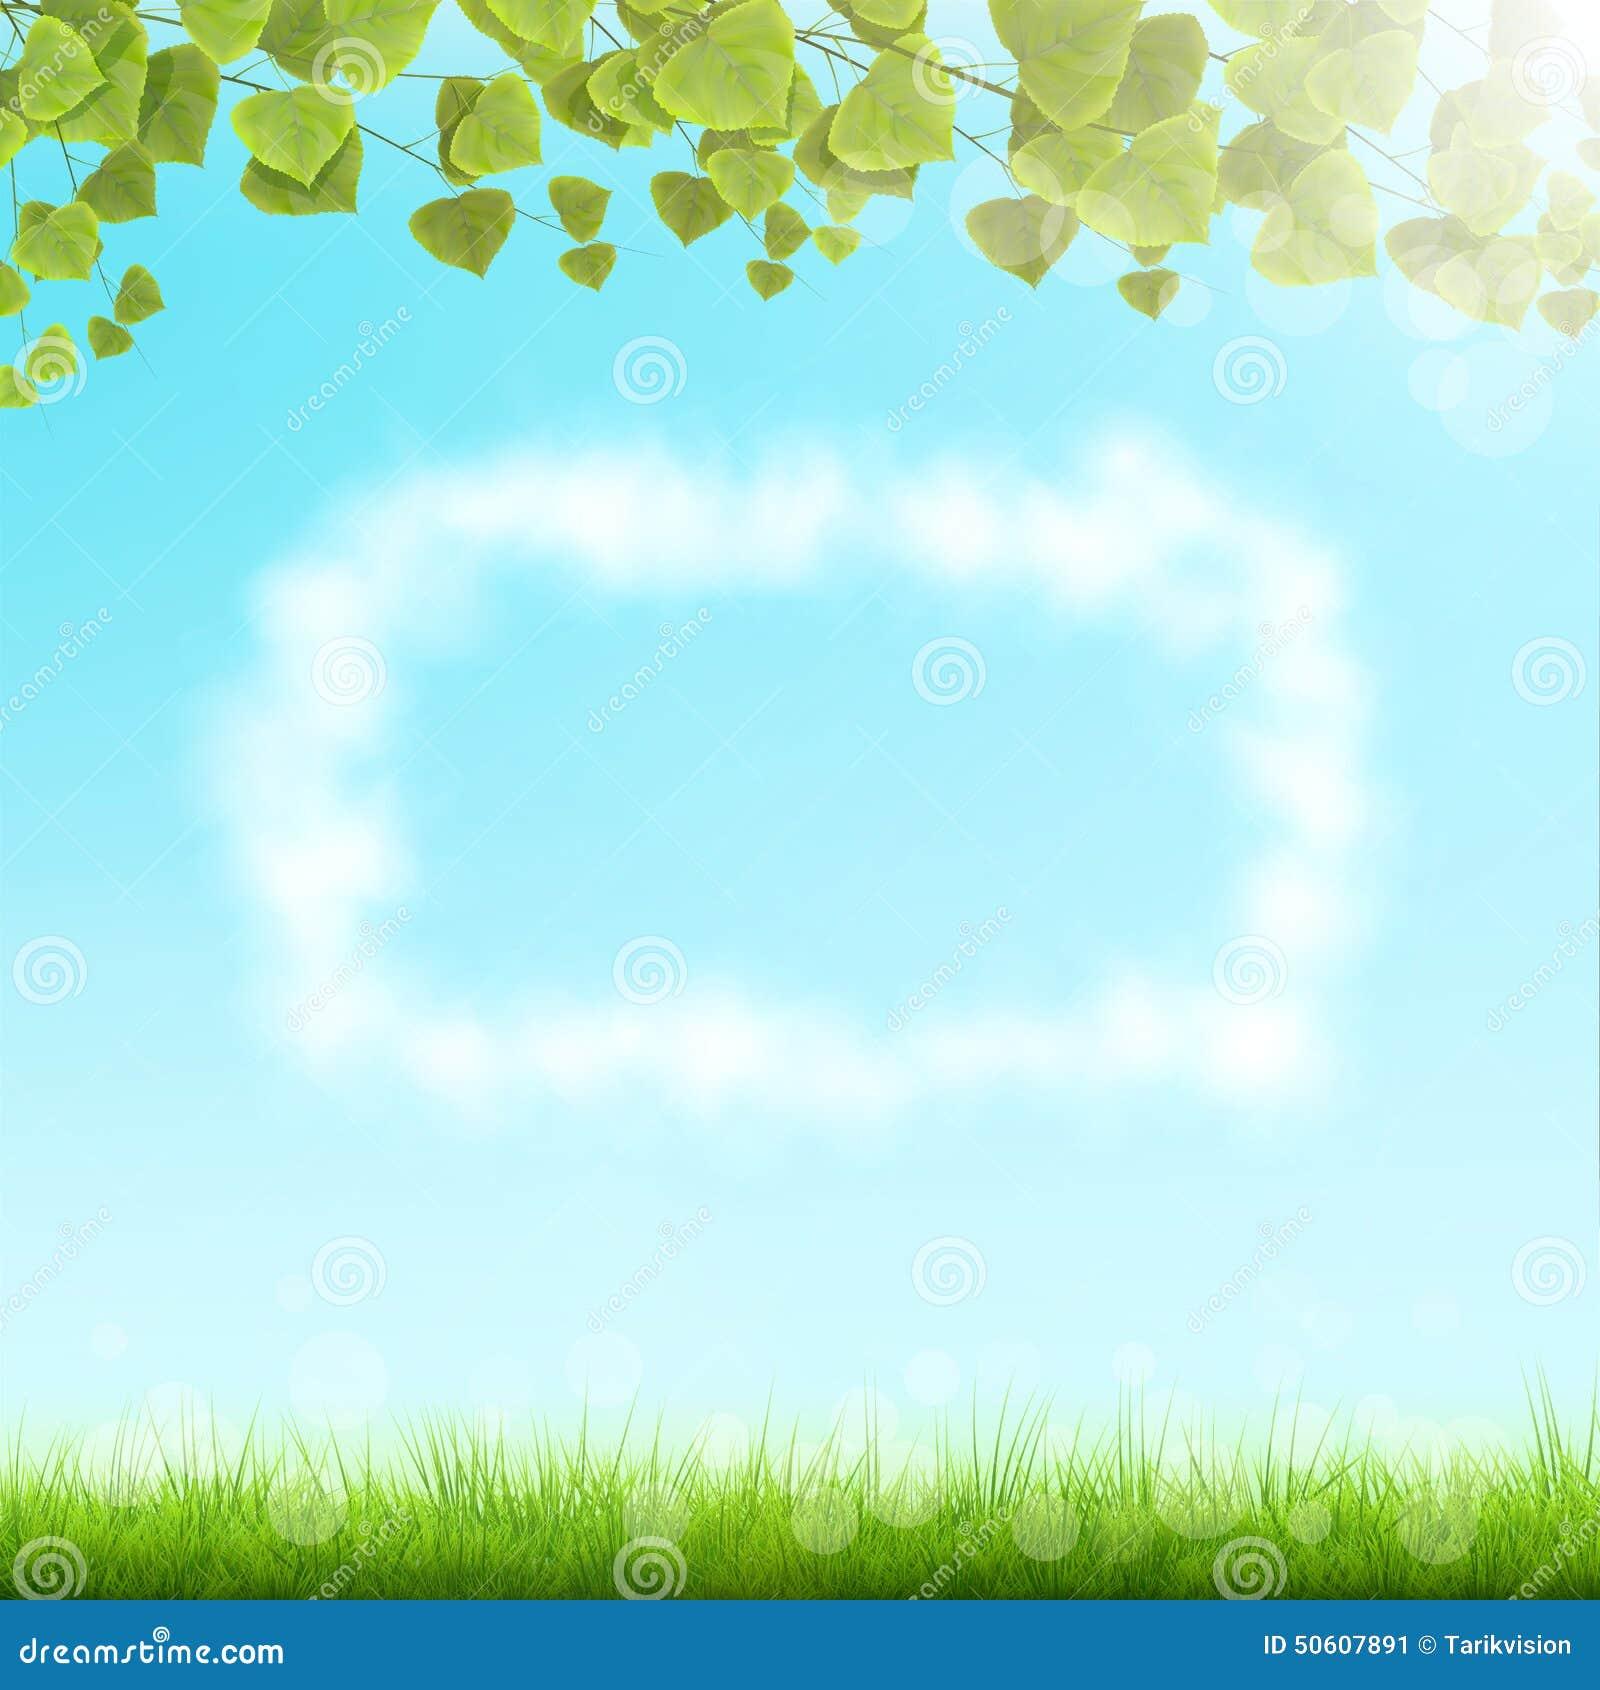 cloud frame on sky background stock image